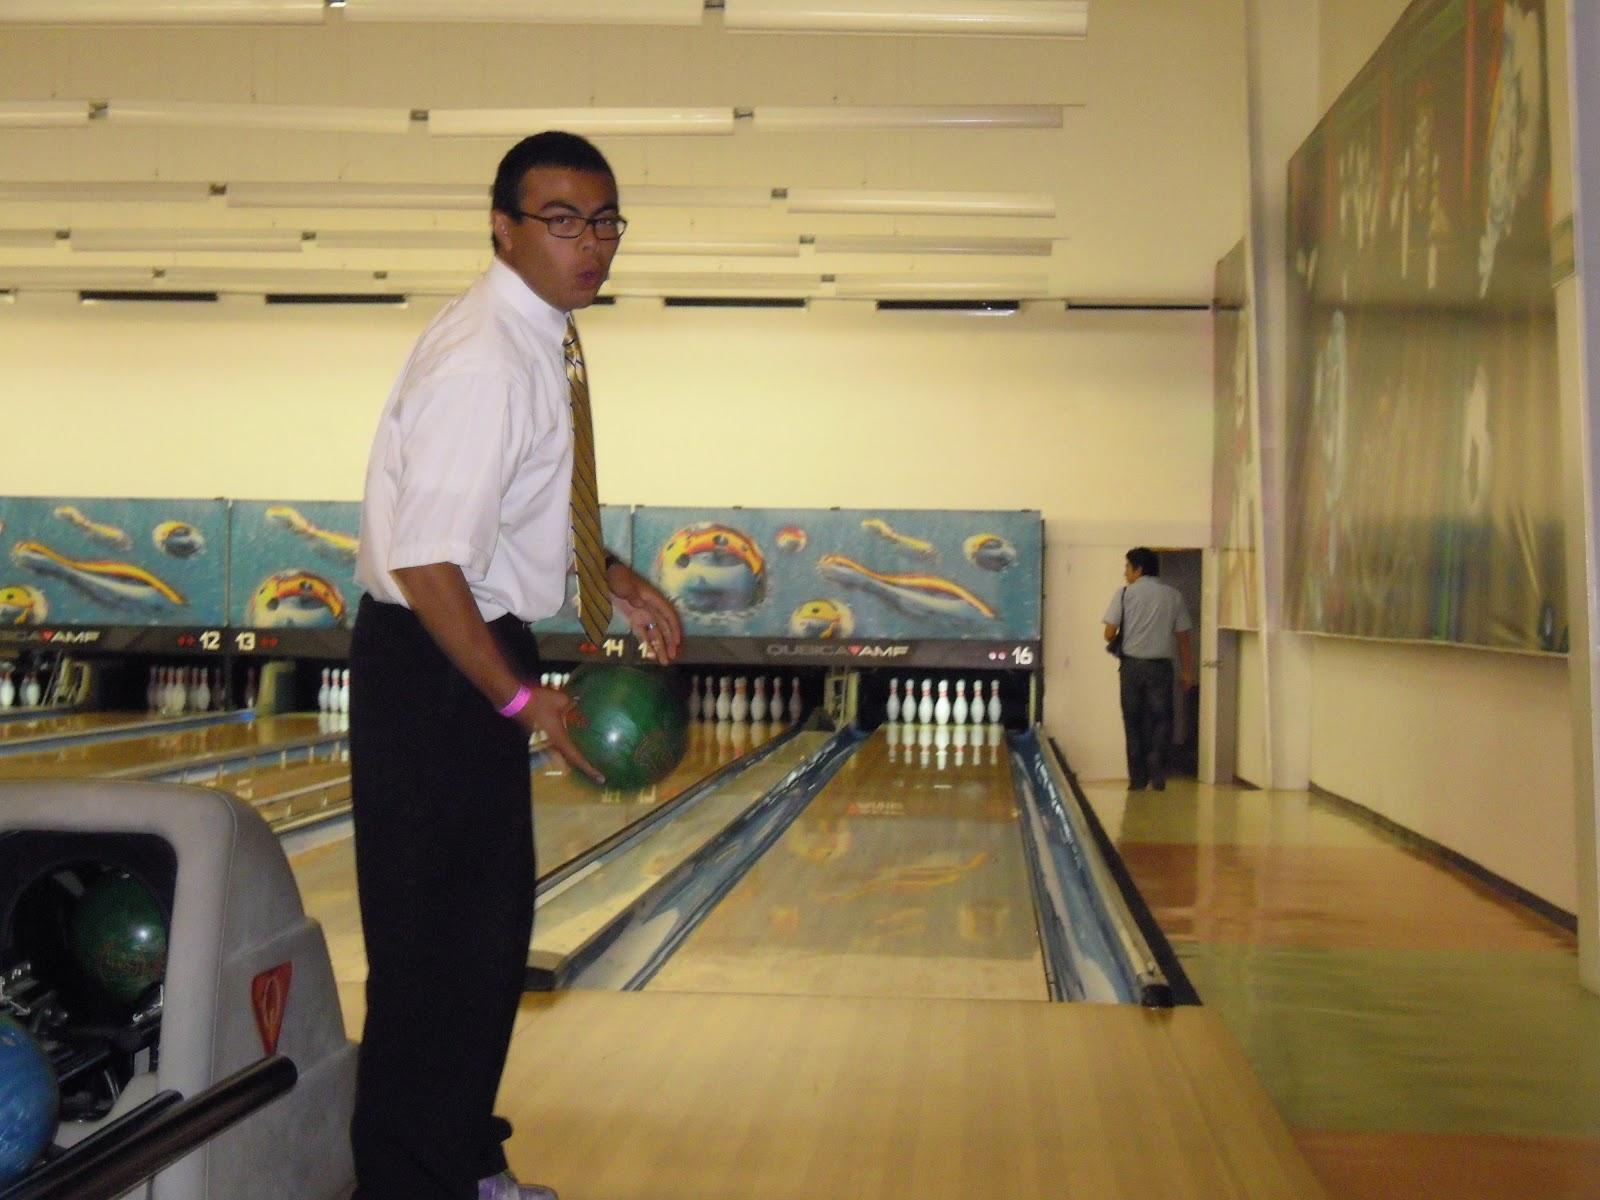 bowling steps to success pdf